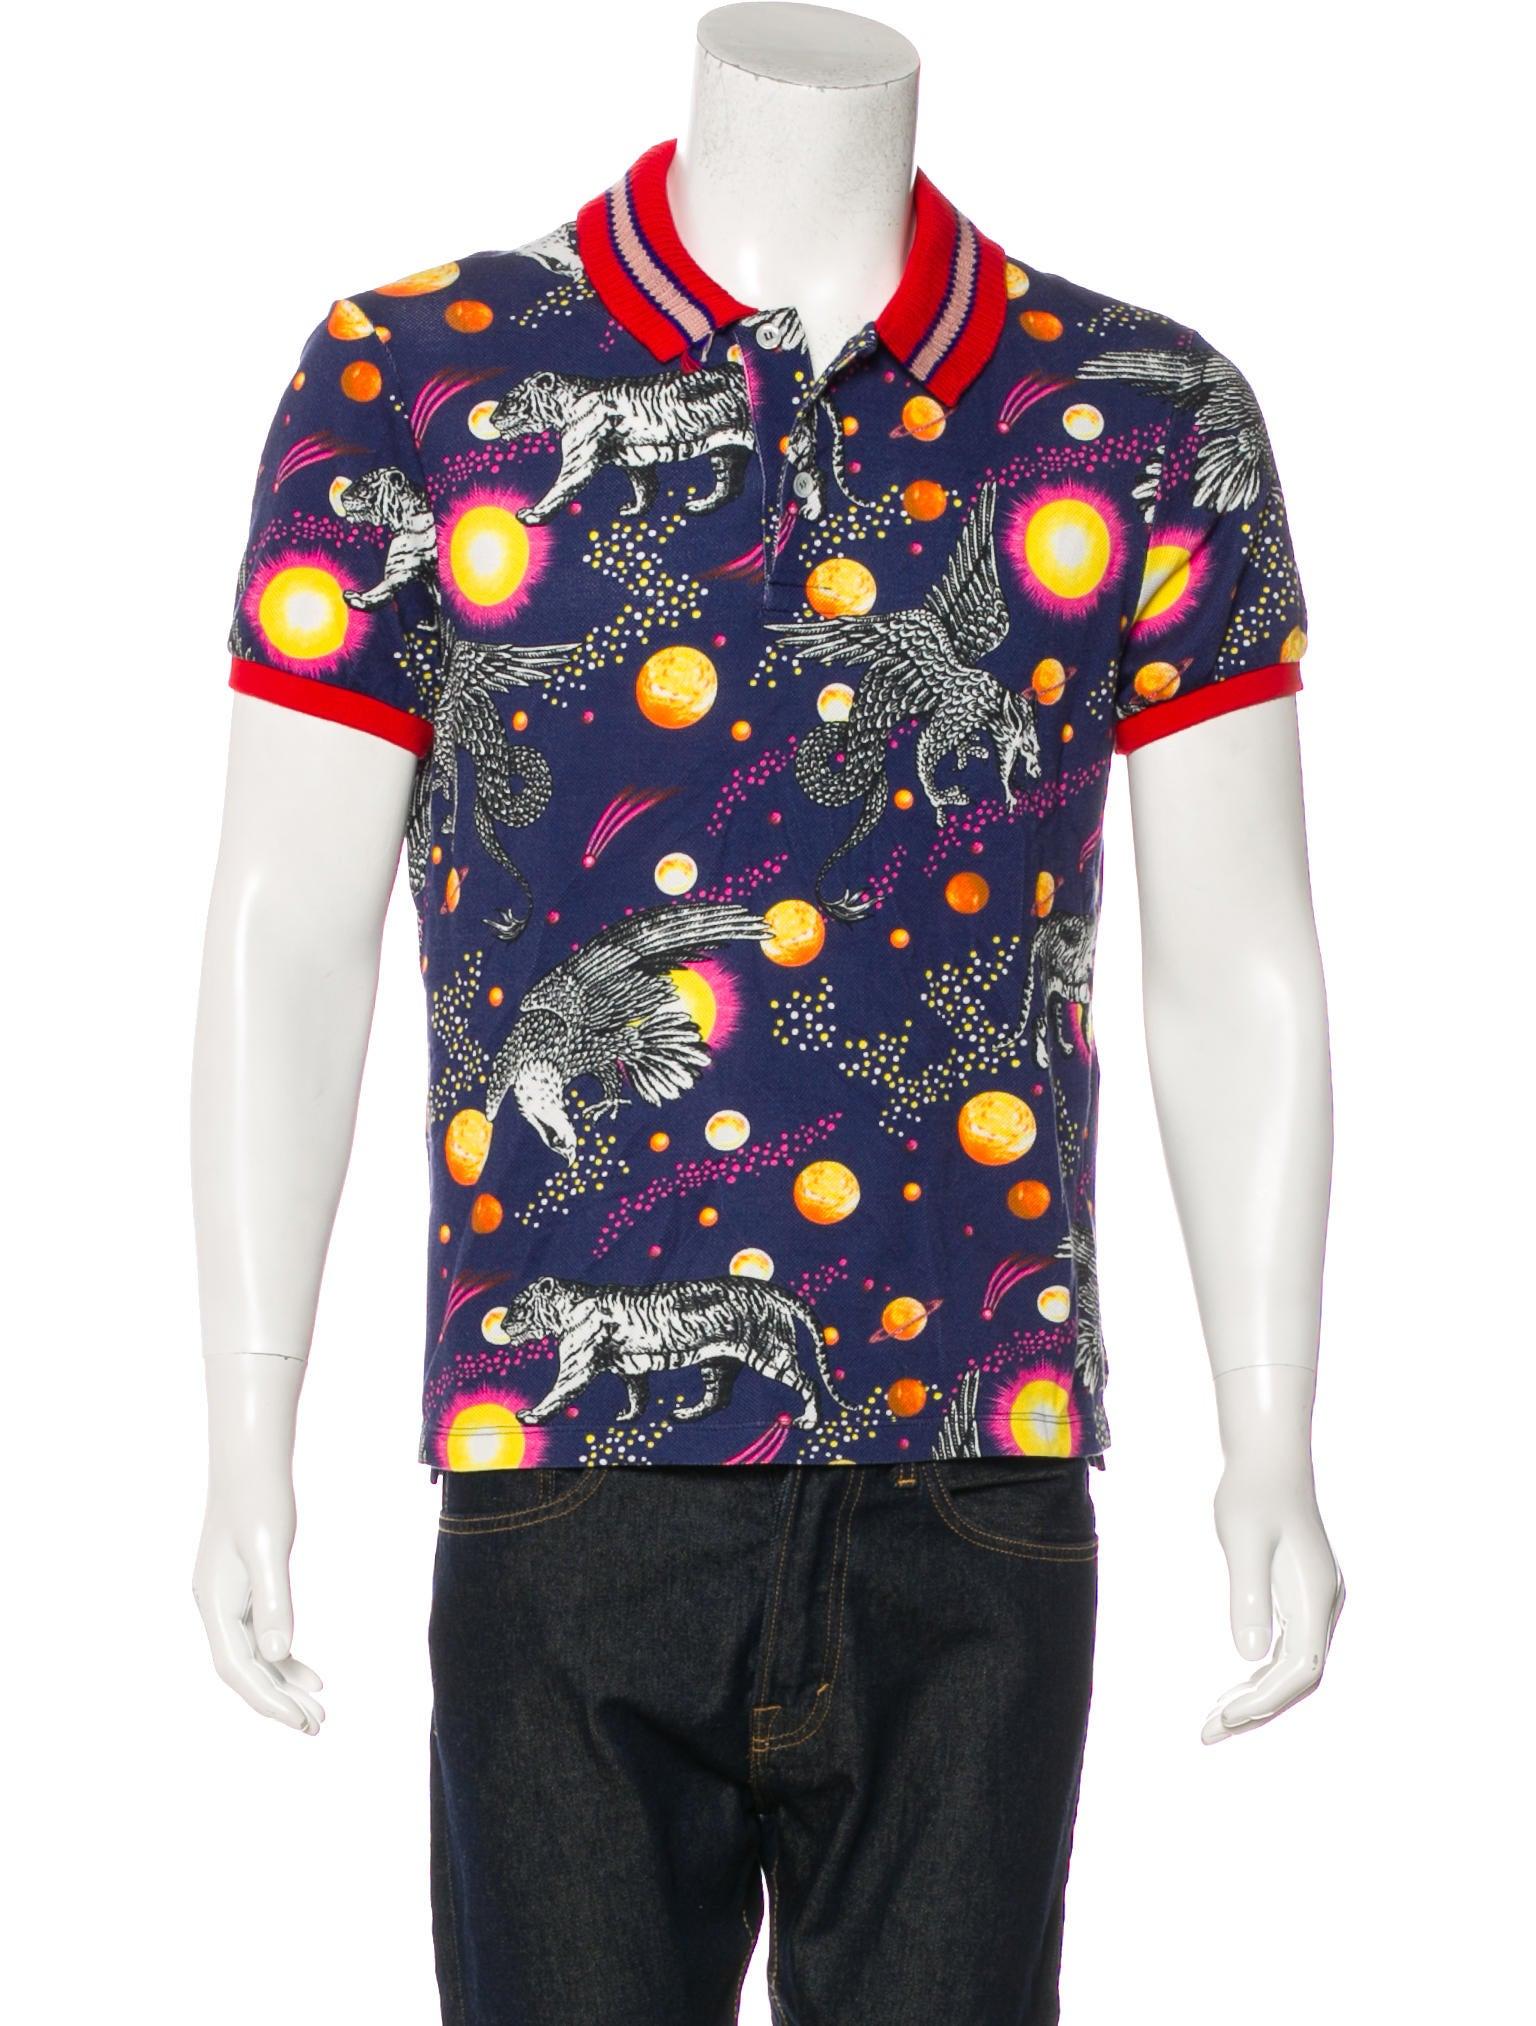 767c6103084106 Gucci 2017 Space Tiger Print Polo Shirt - Clothing - GUC186389   The ...